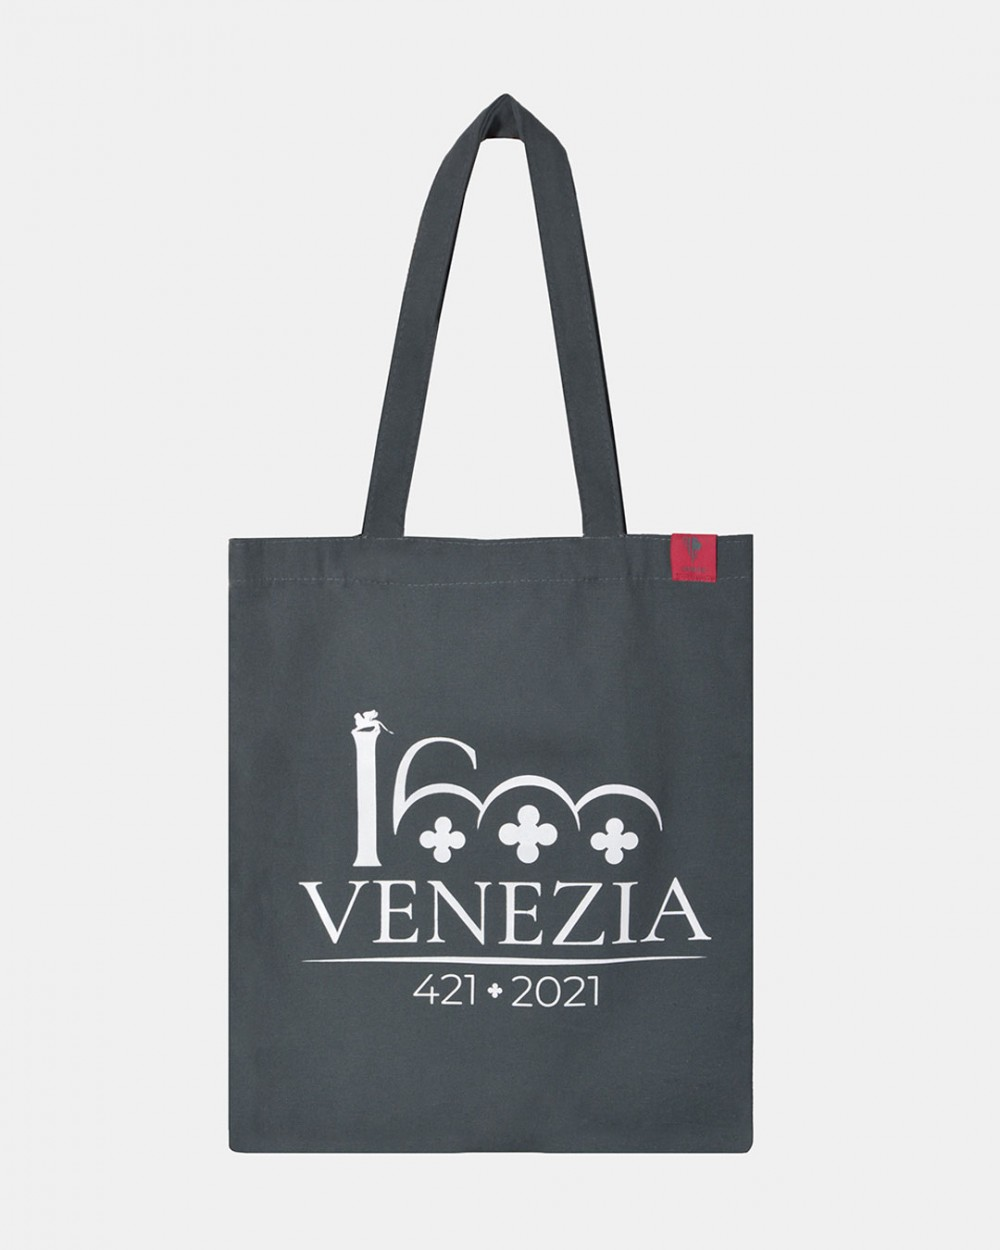 Grey shopper white Venezia 1600 logotype front